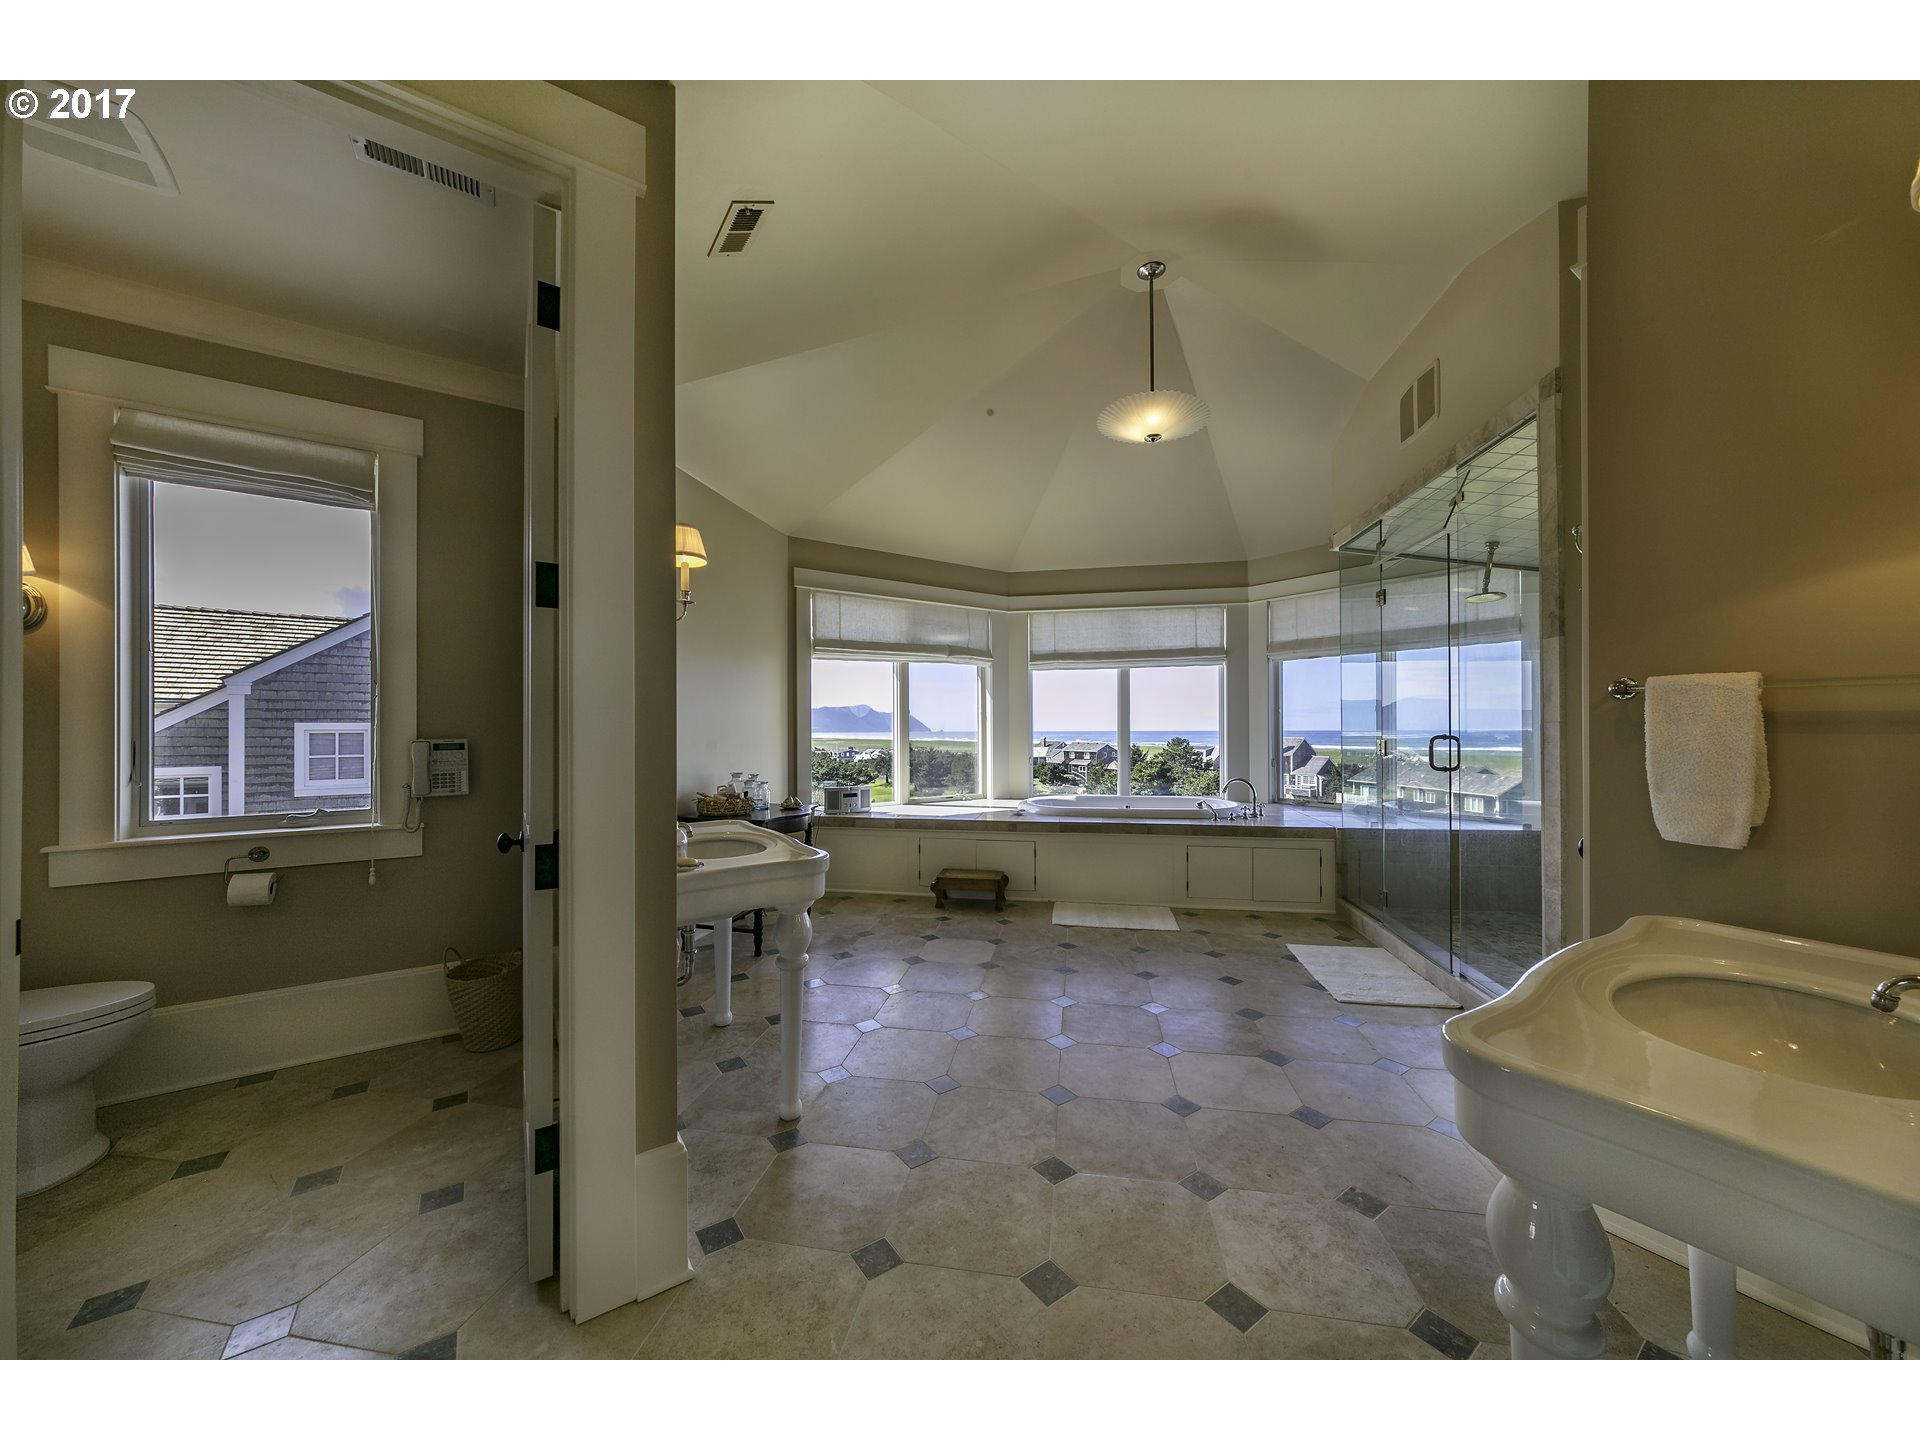 5180 High Ridge RD Gearhart, OR 97138 - MLS #: 17655708